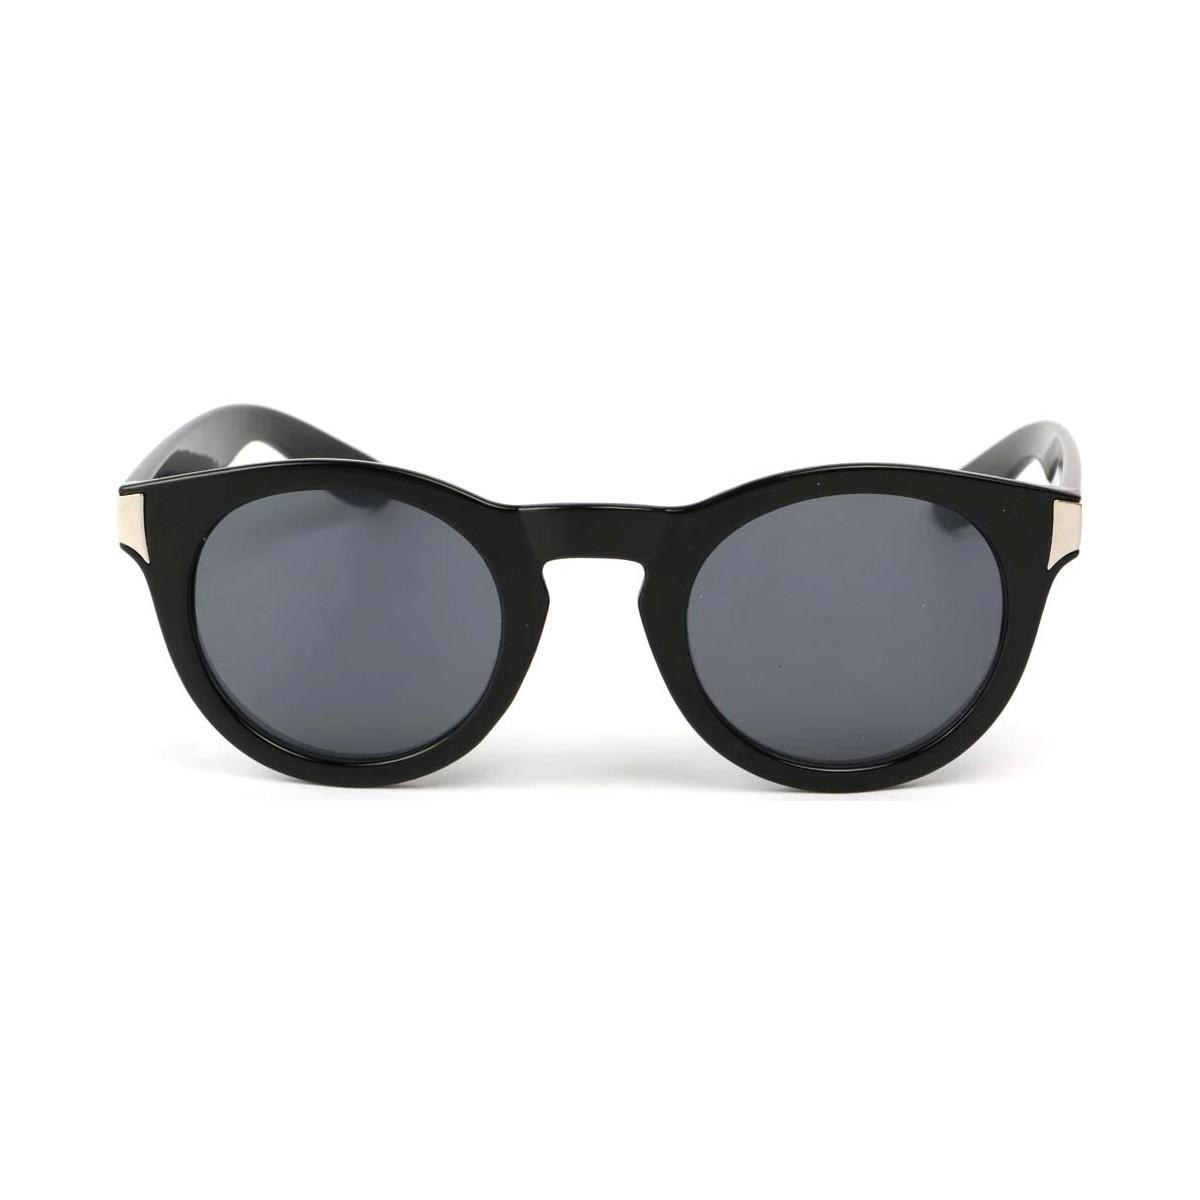 Eye Wear Lunettes Soleil Really avec monture noire Noir